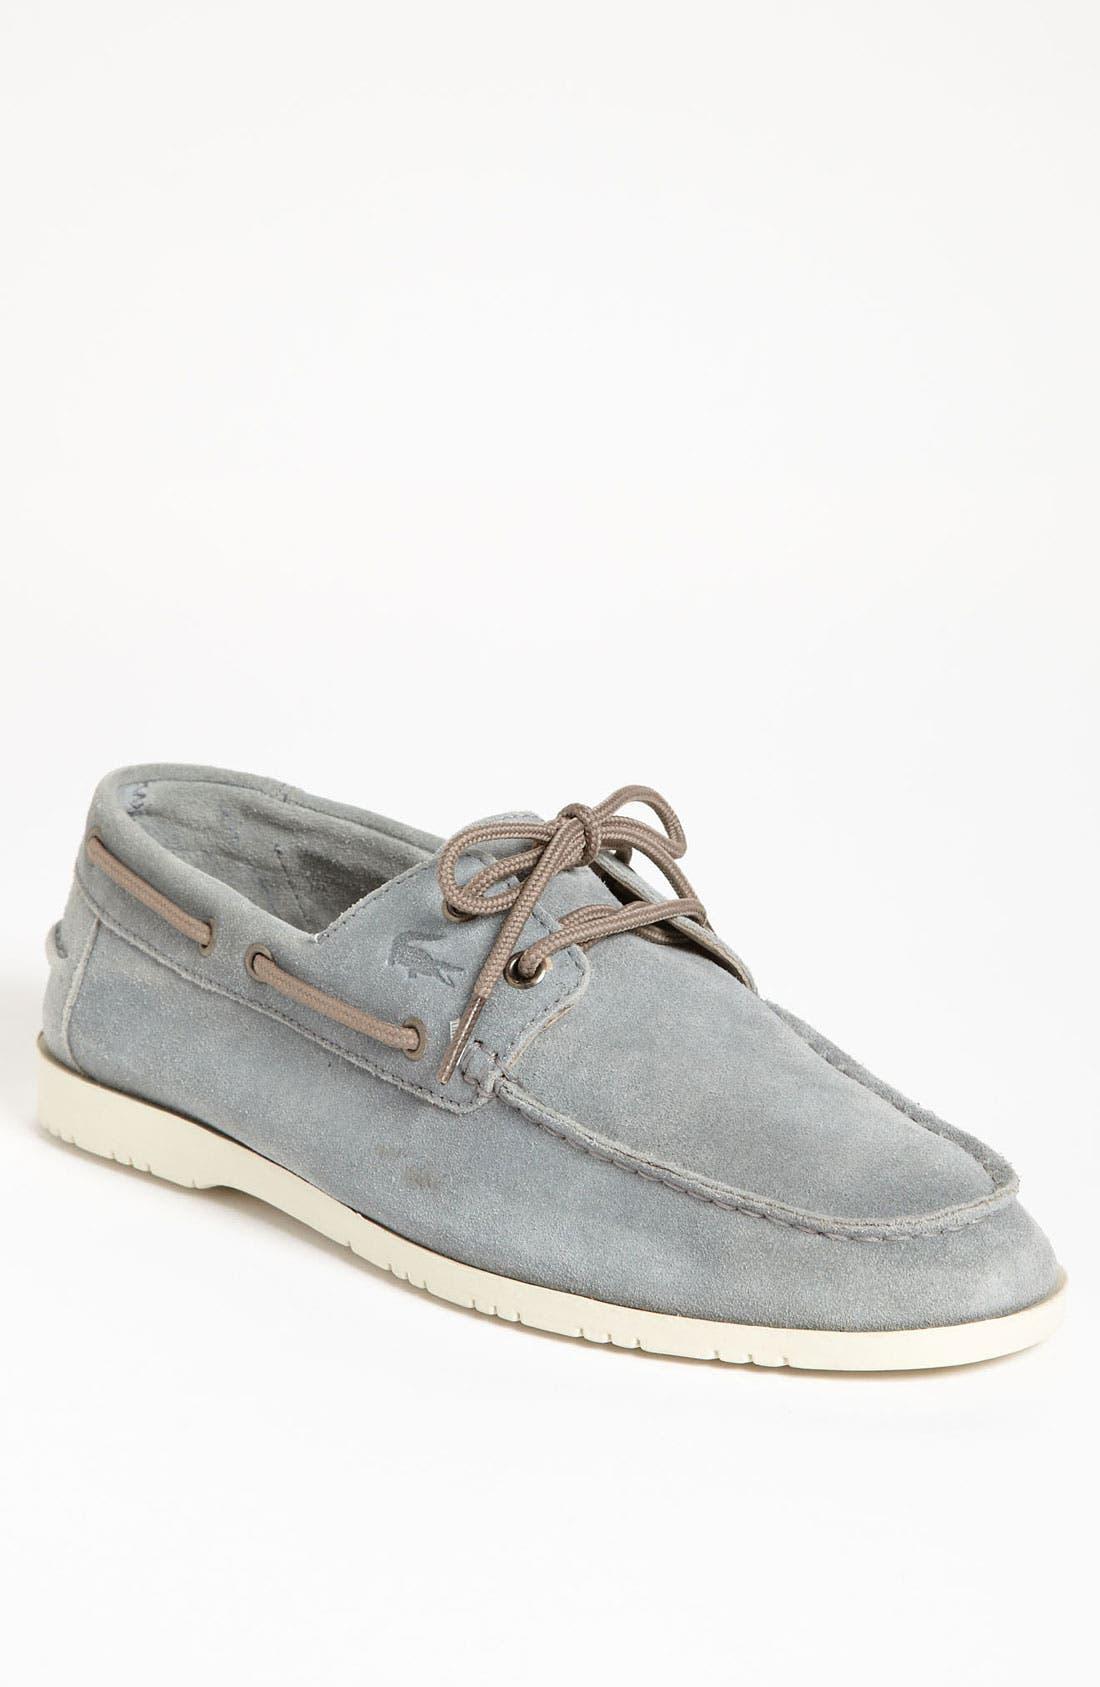 Main Image - Lacoste 'Corbon 4' Boat Shoe